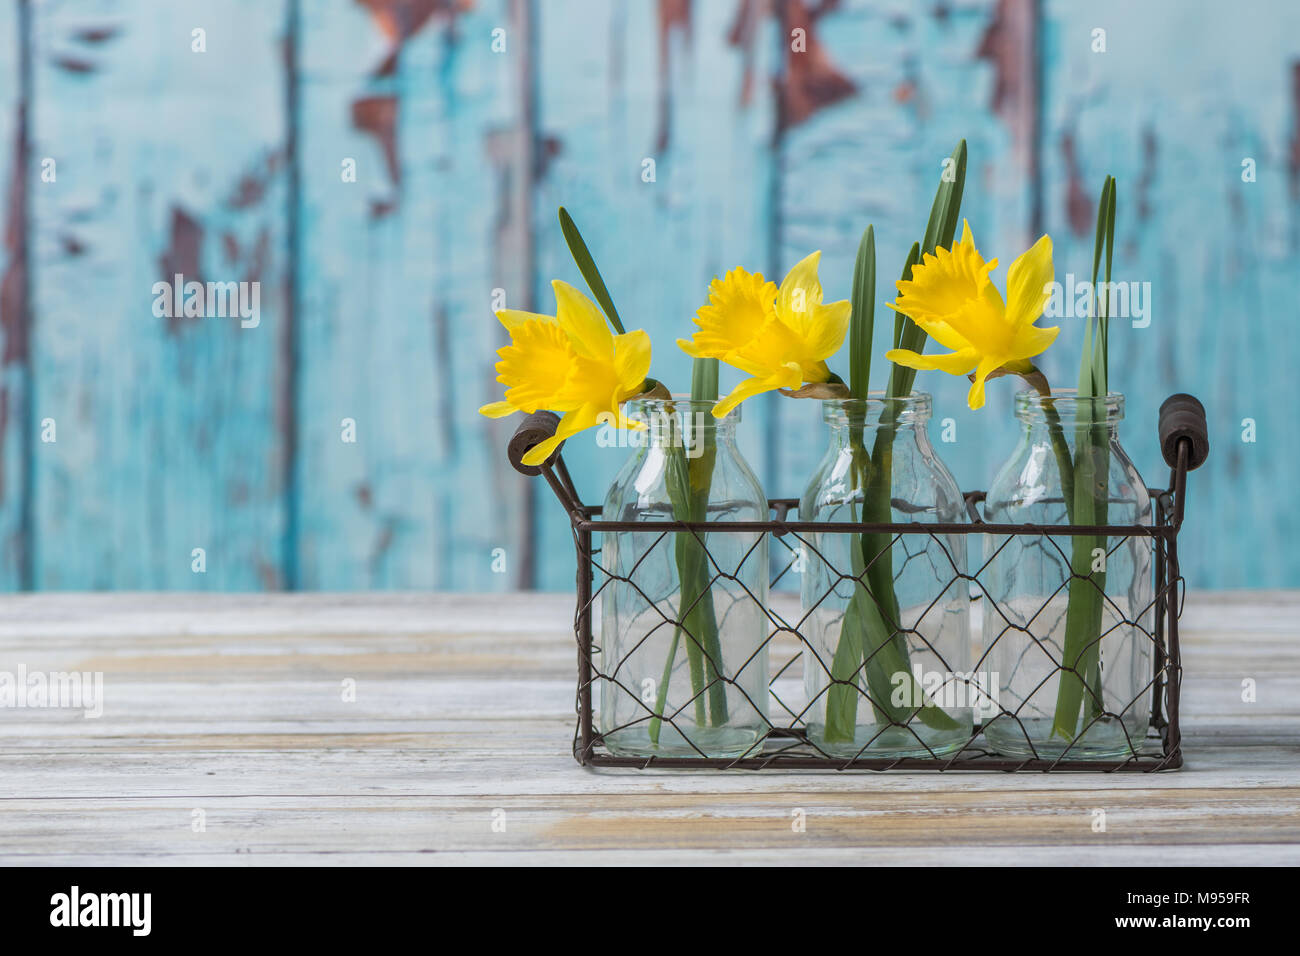 Daffodils in wire basket Stock Photo: 177752843 - Alamy